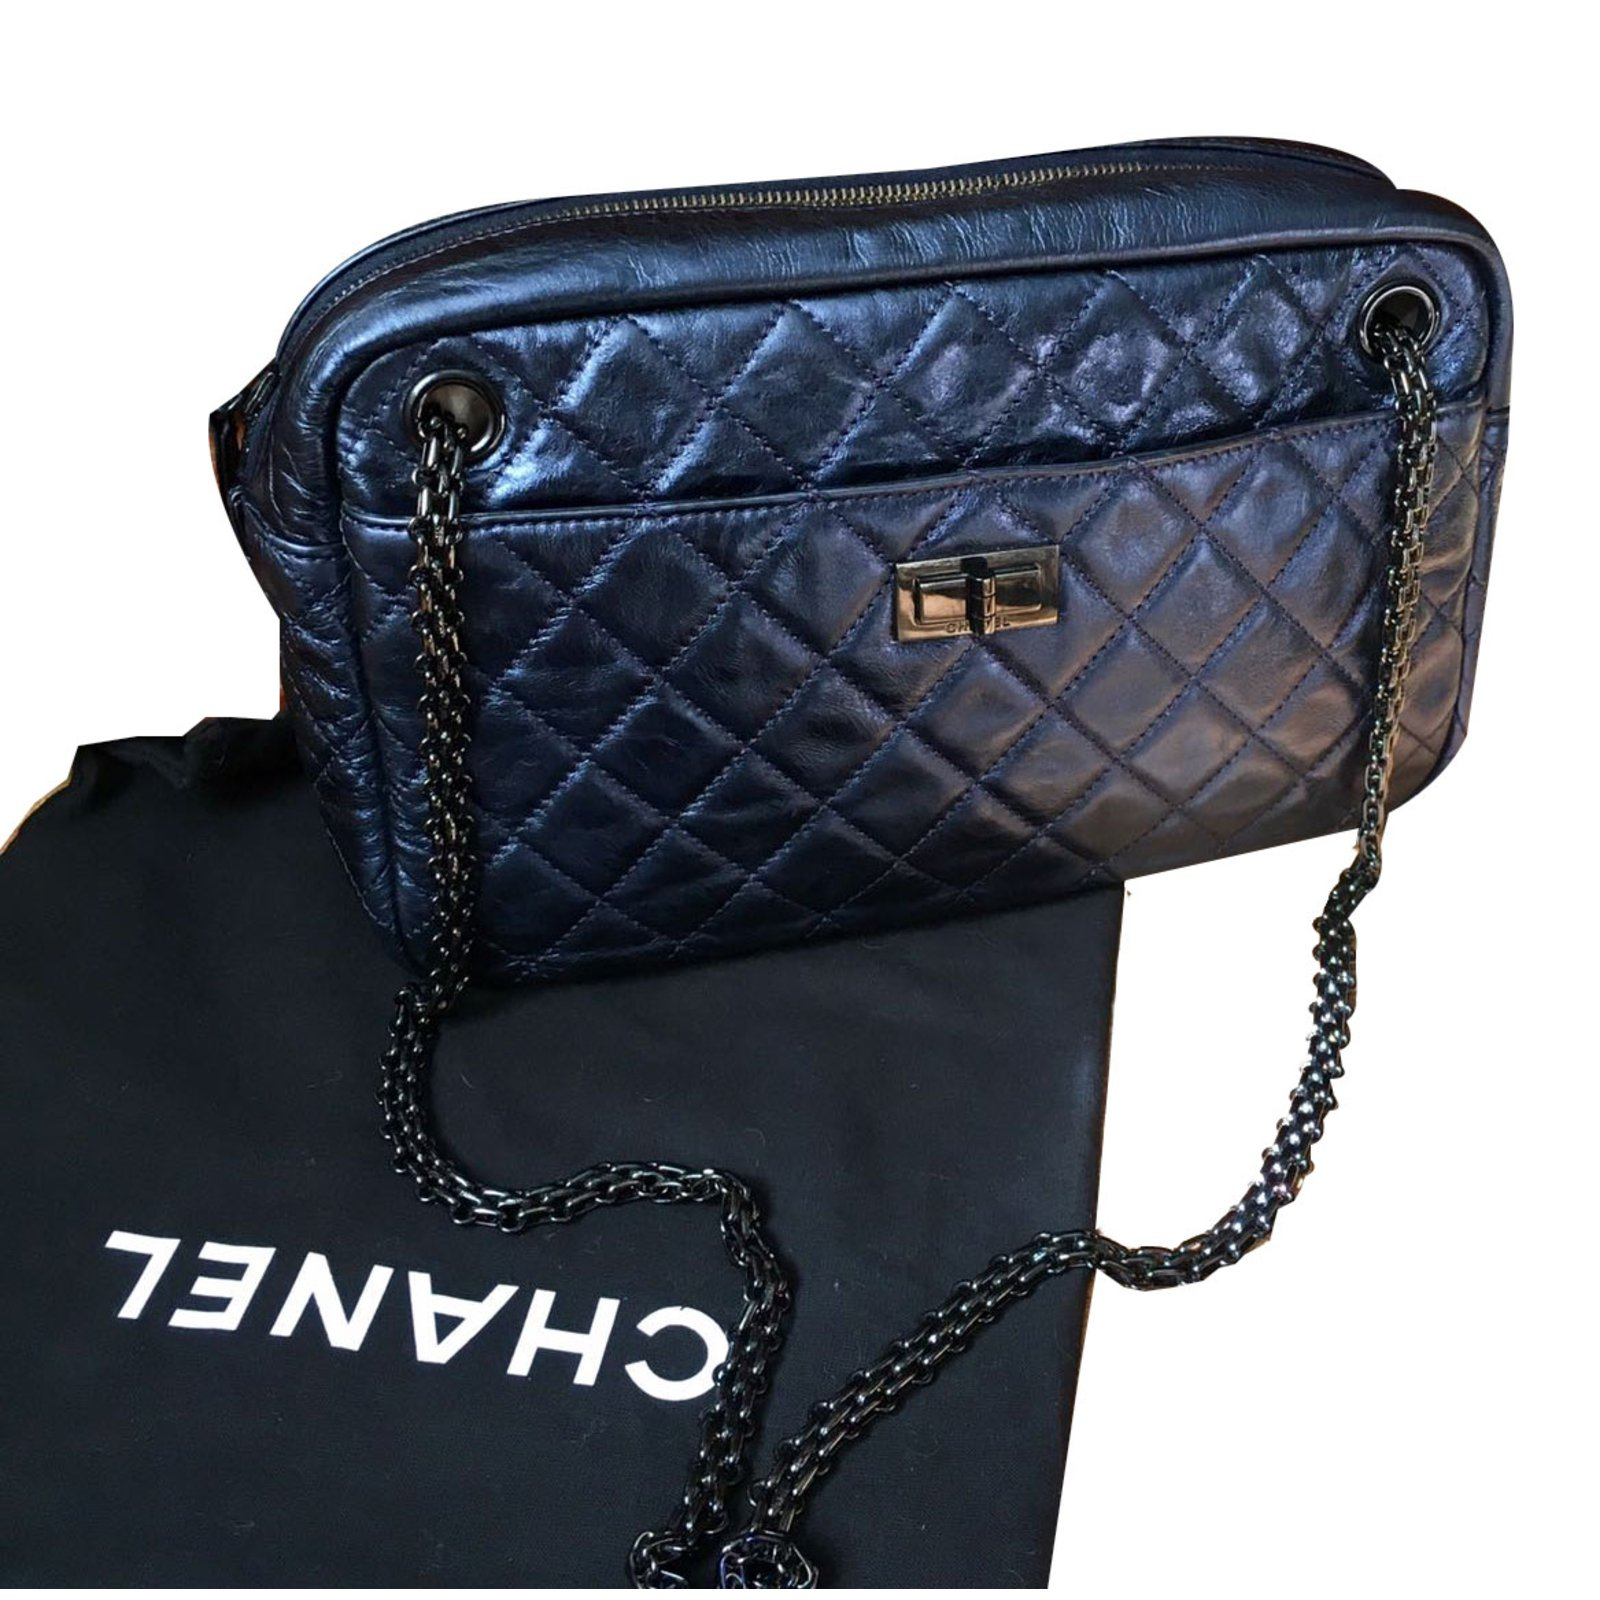 991f7679fcb5 Chanel Camera bag Handbags Leather Purple ref.40703 - Joli Closet